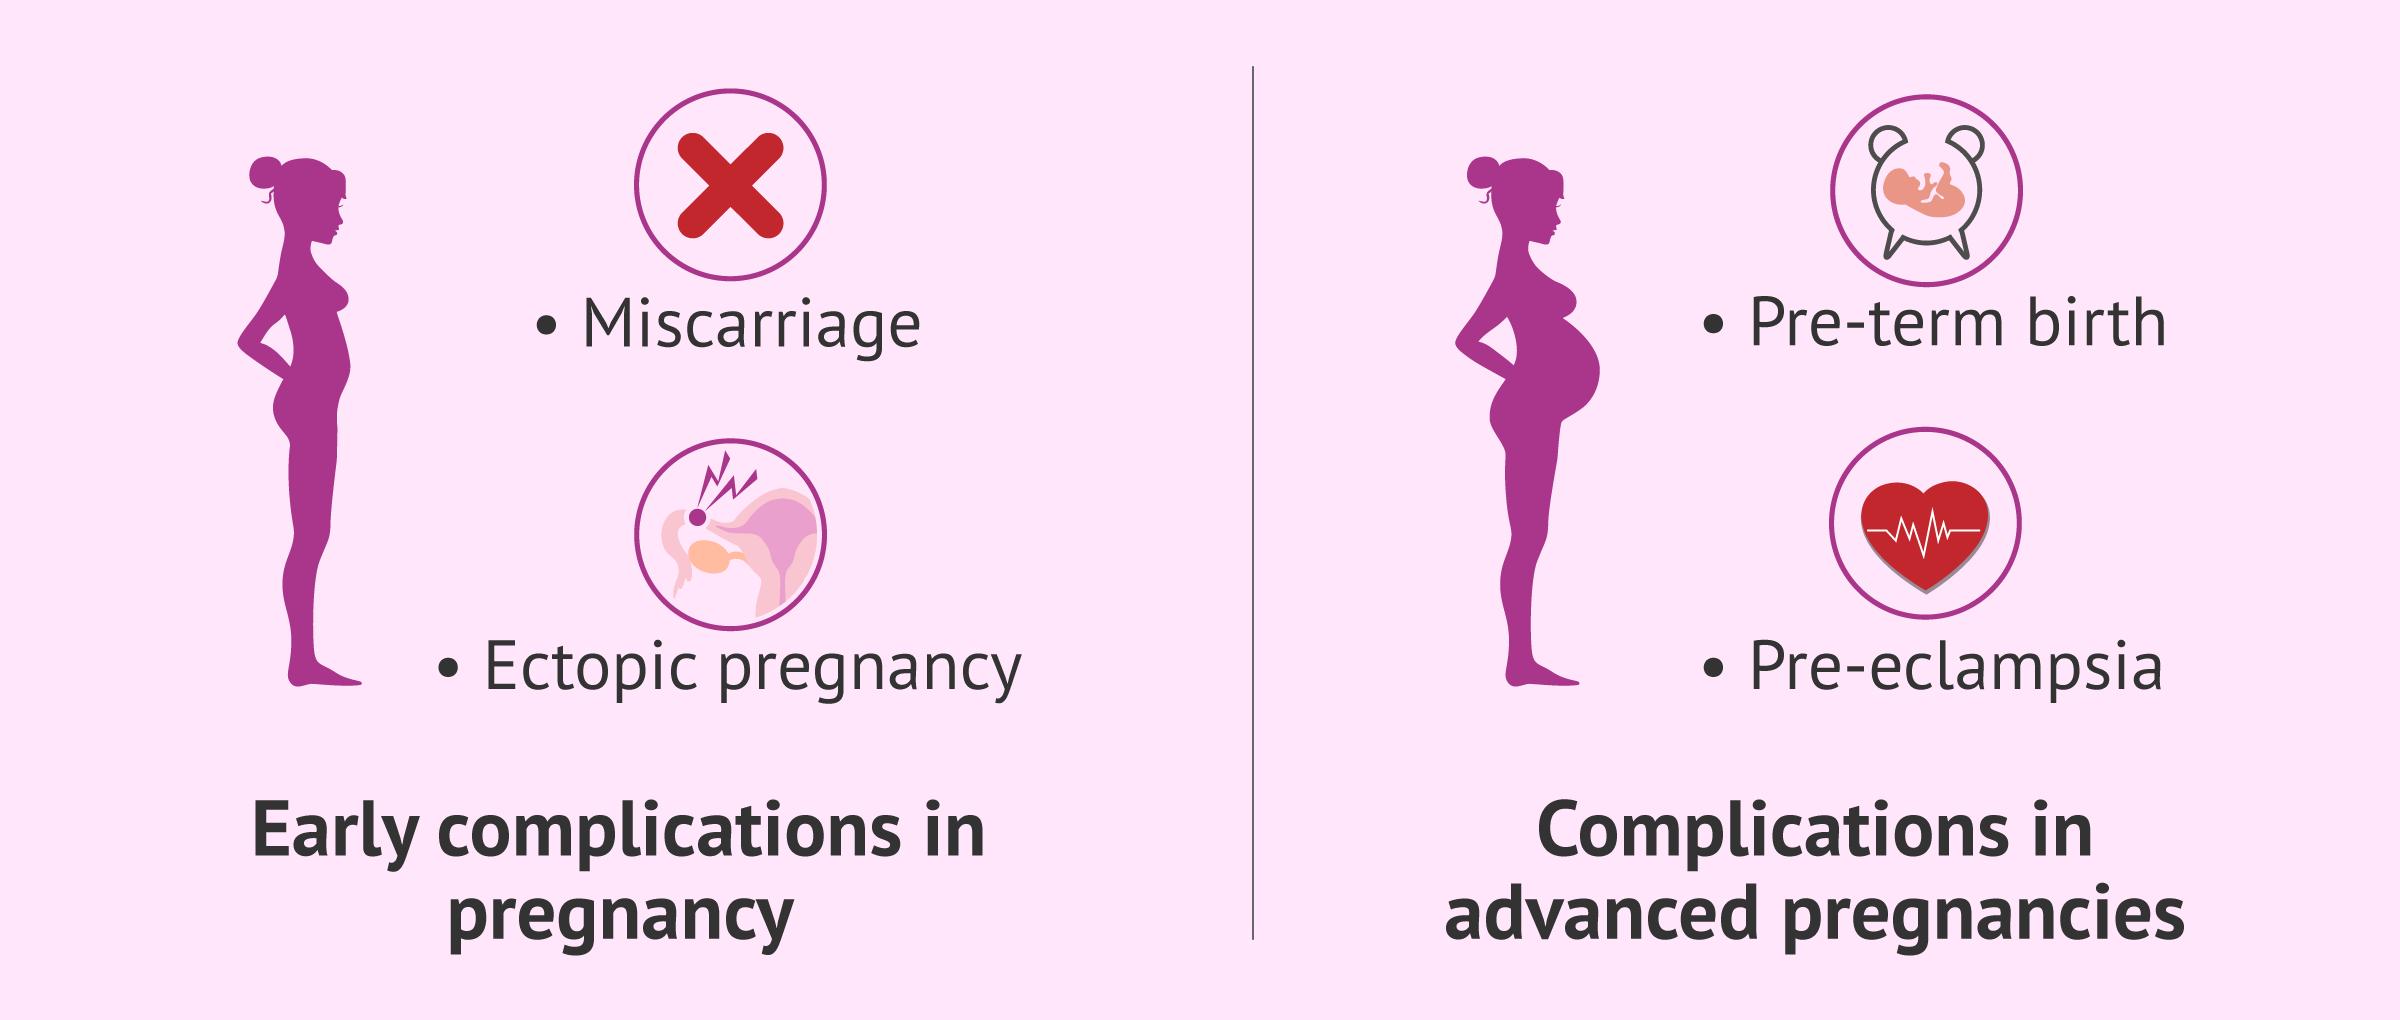 Imagen: Pregnancy complications due to endometriosis